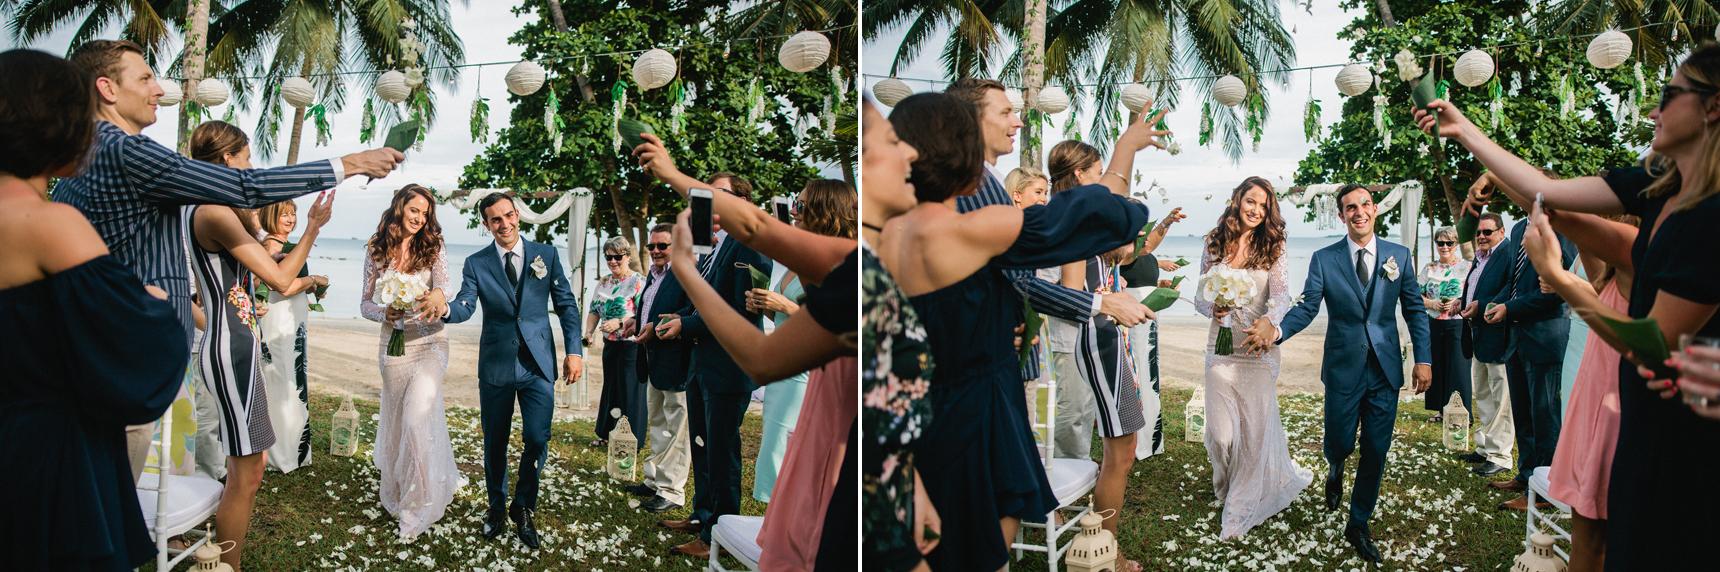 TB_VillaKalyana_KohSamui_WeddingPhotographer_Thailand061.jpg